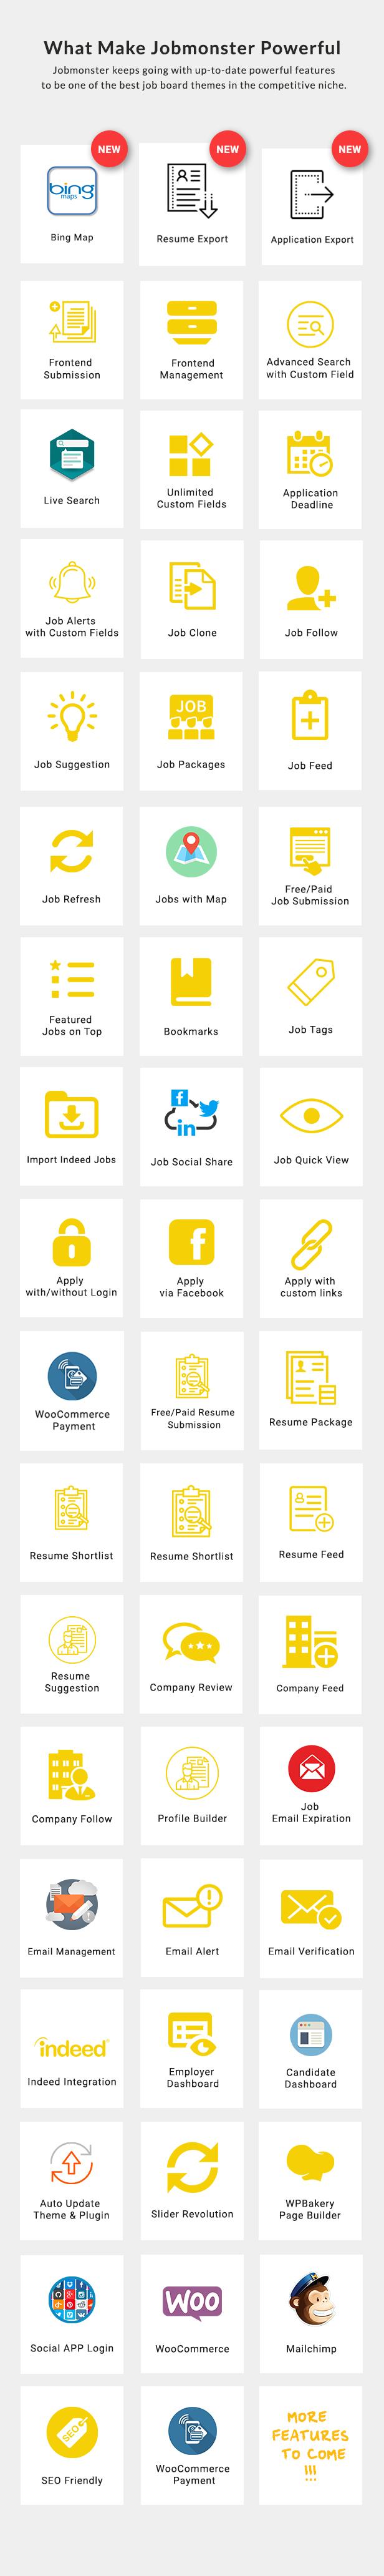 Jobmonster - Job Board WordPress Theme - 15